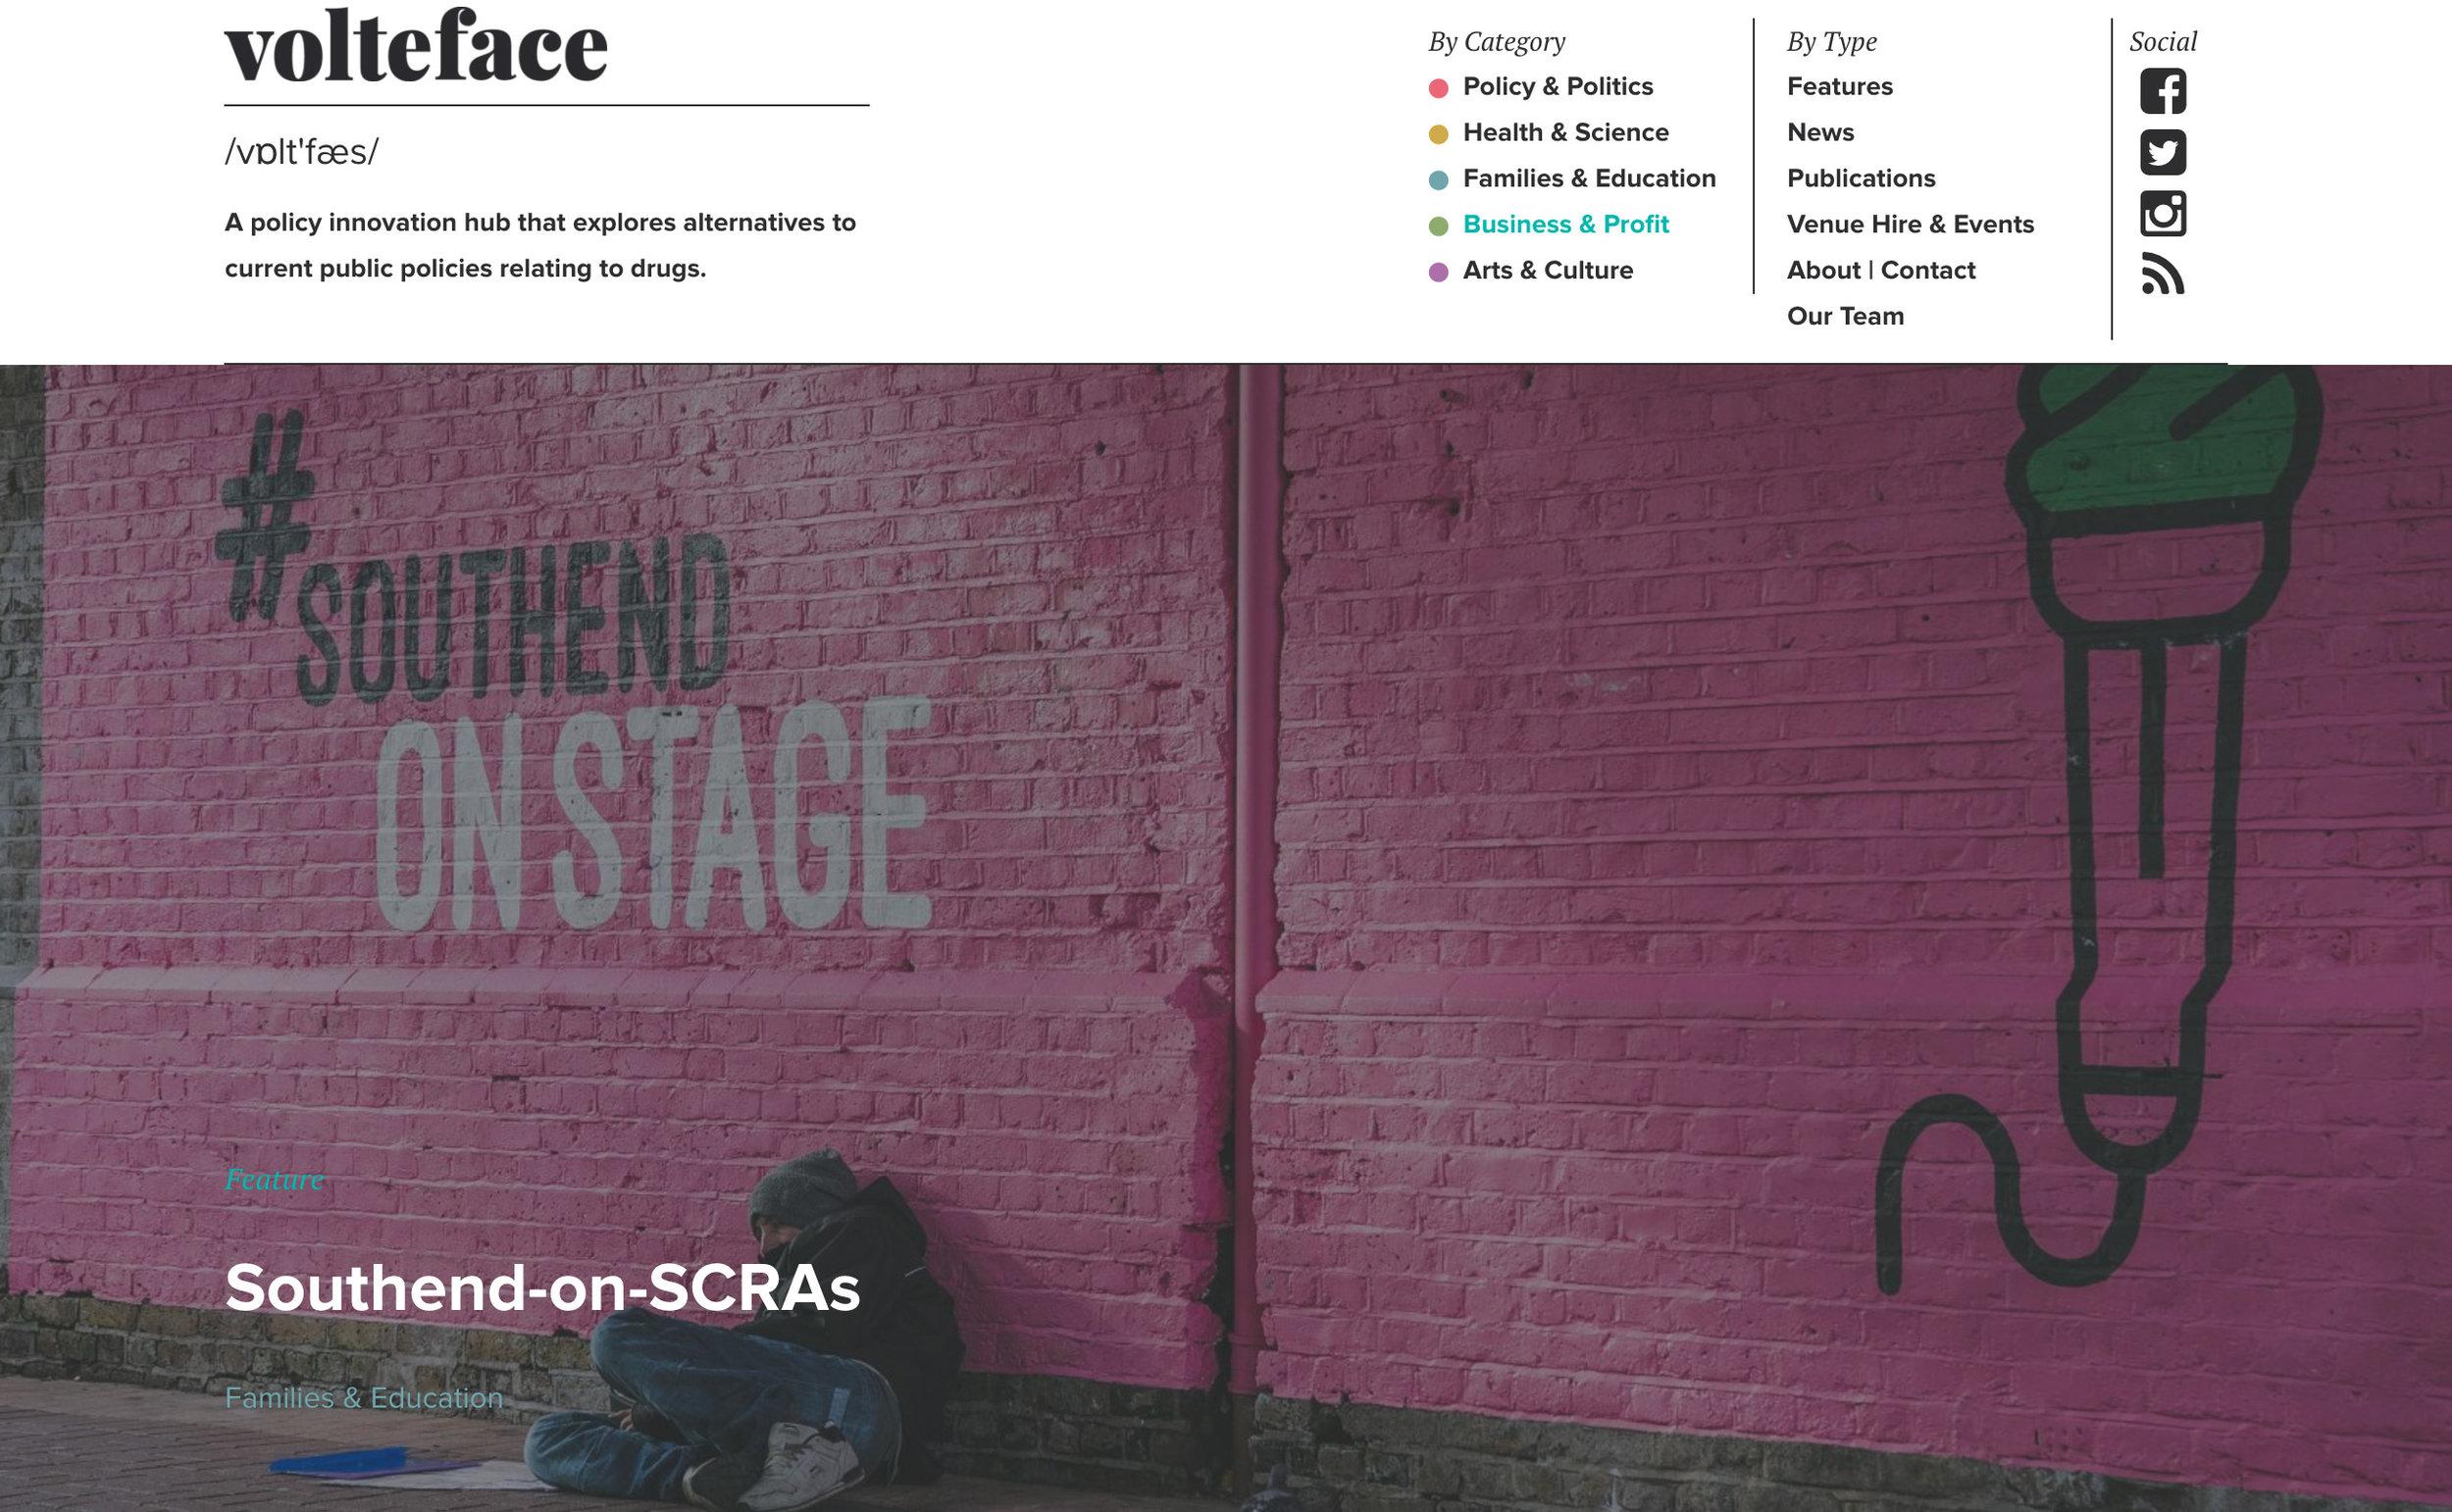 Southend-Spice-Volteface.jpg